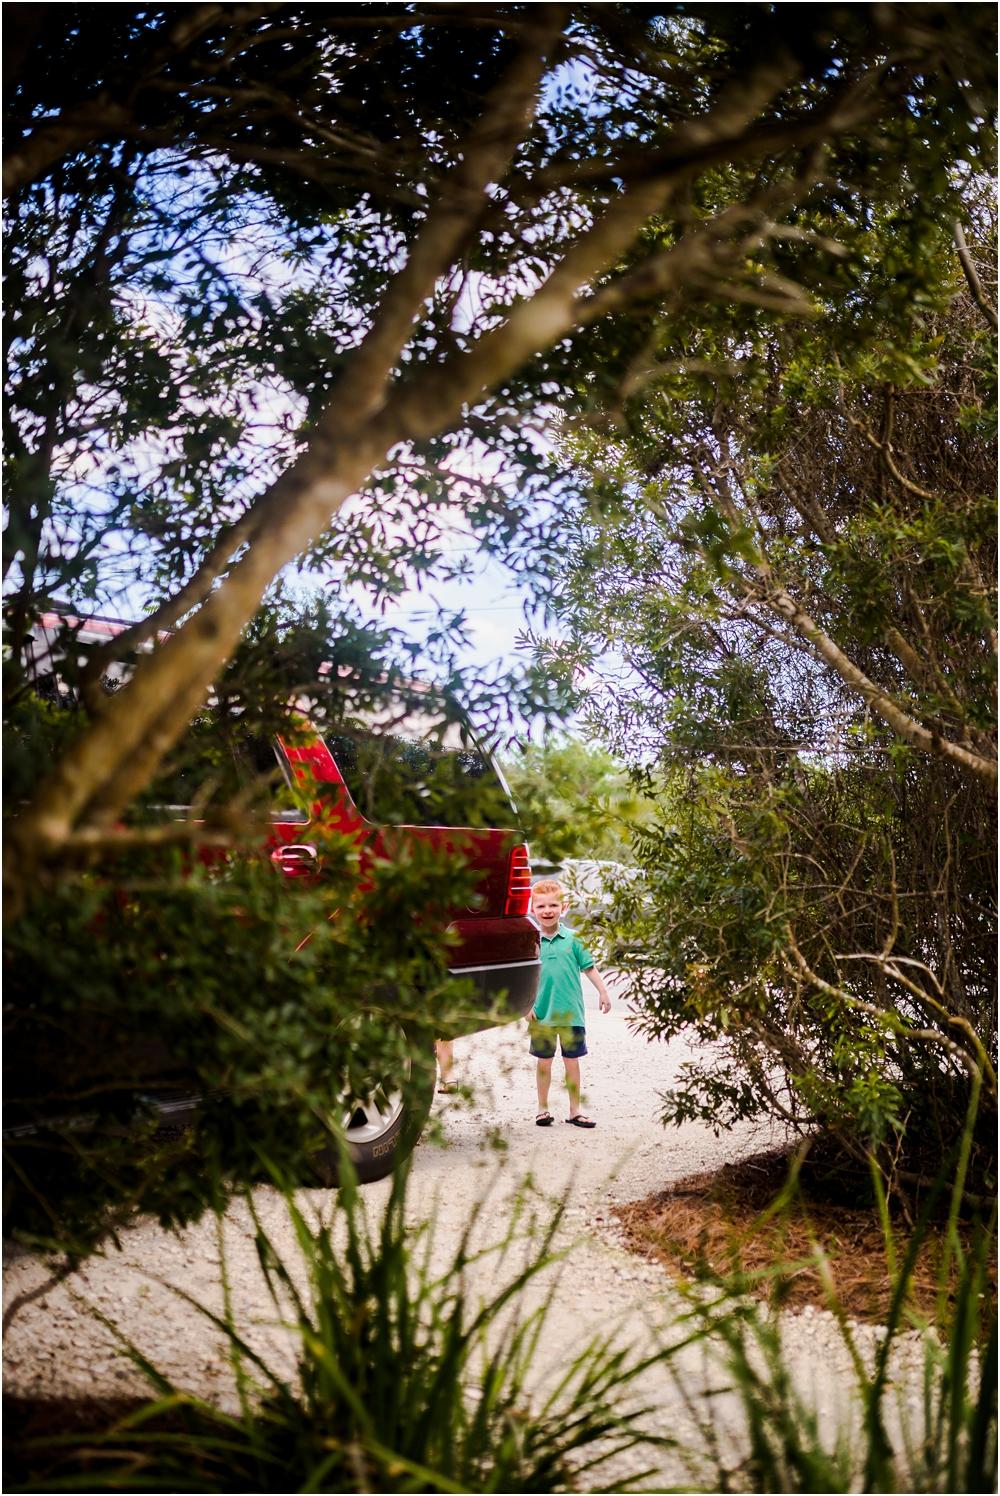 mcglothlin-wedding-kiersten-stevenson-photography-30a-panama-city-beach-dothan-tallahassee-(59-of-145).jpg